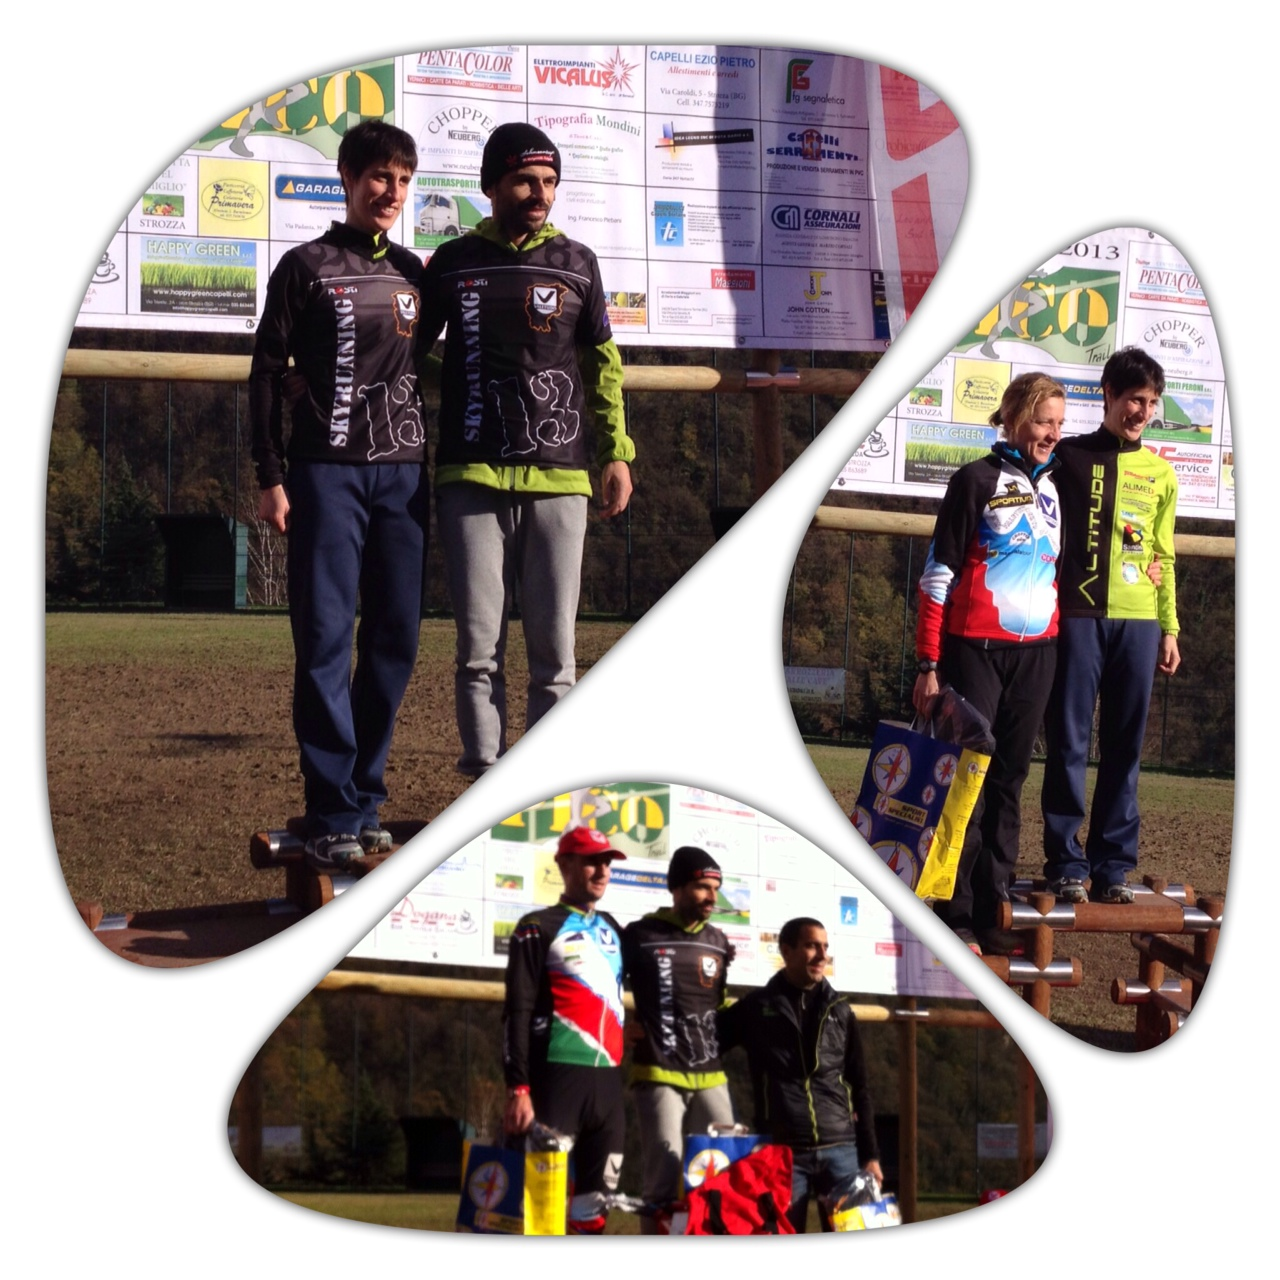 cicuitoskyrunningbergamo2013 podio